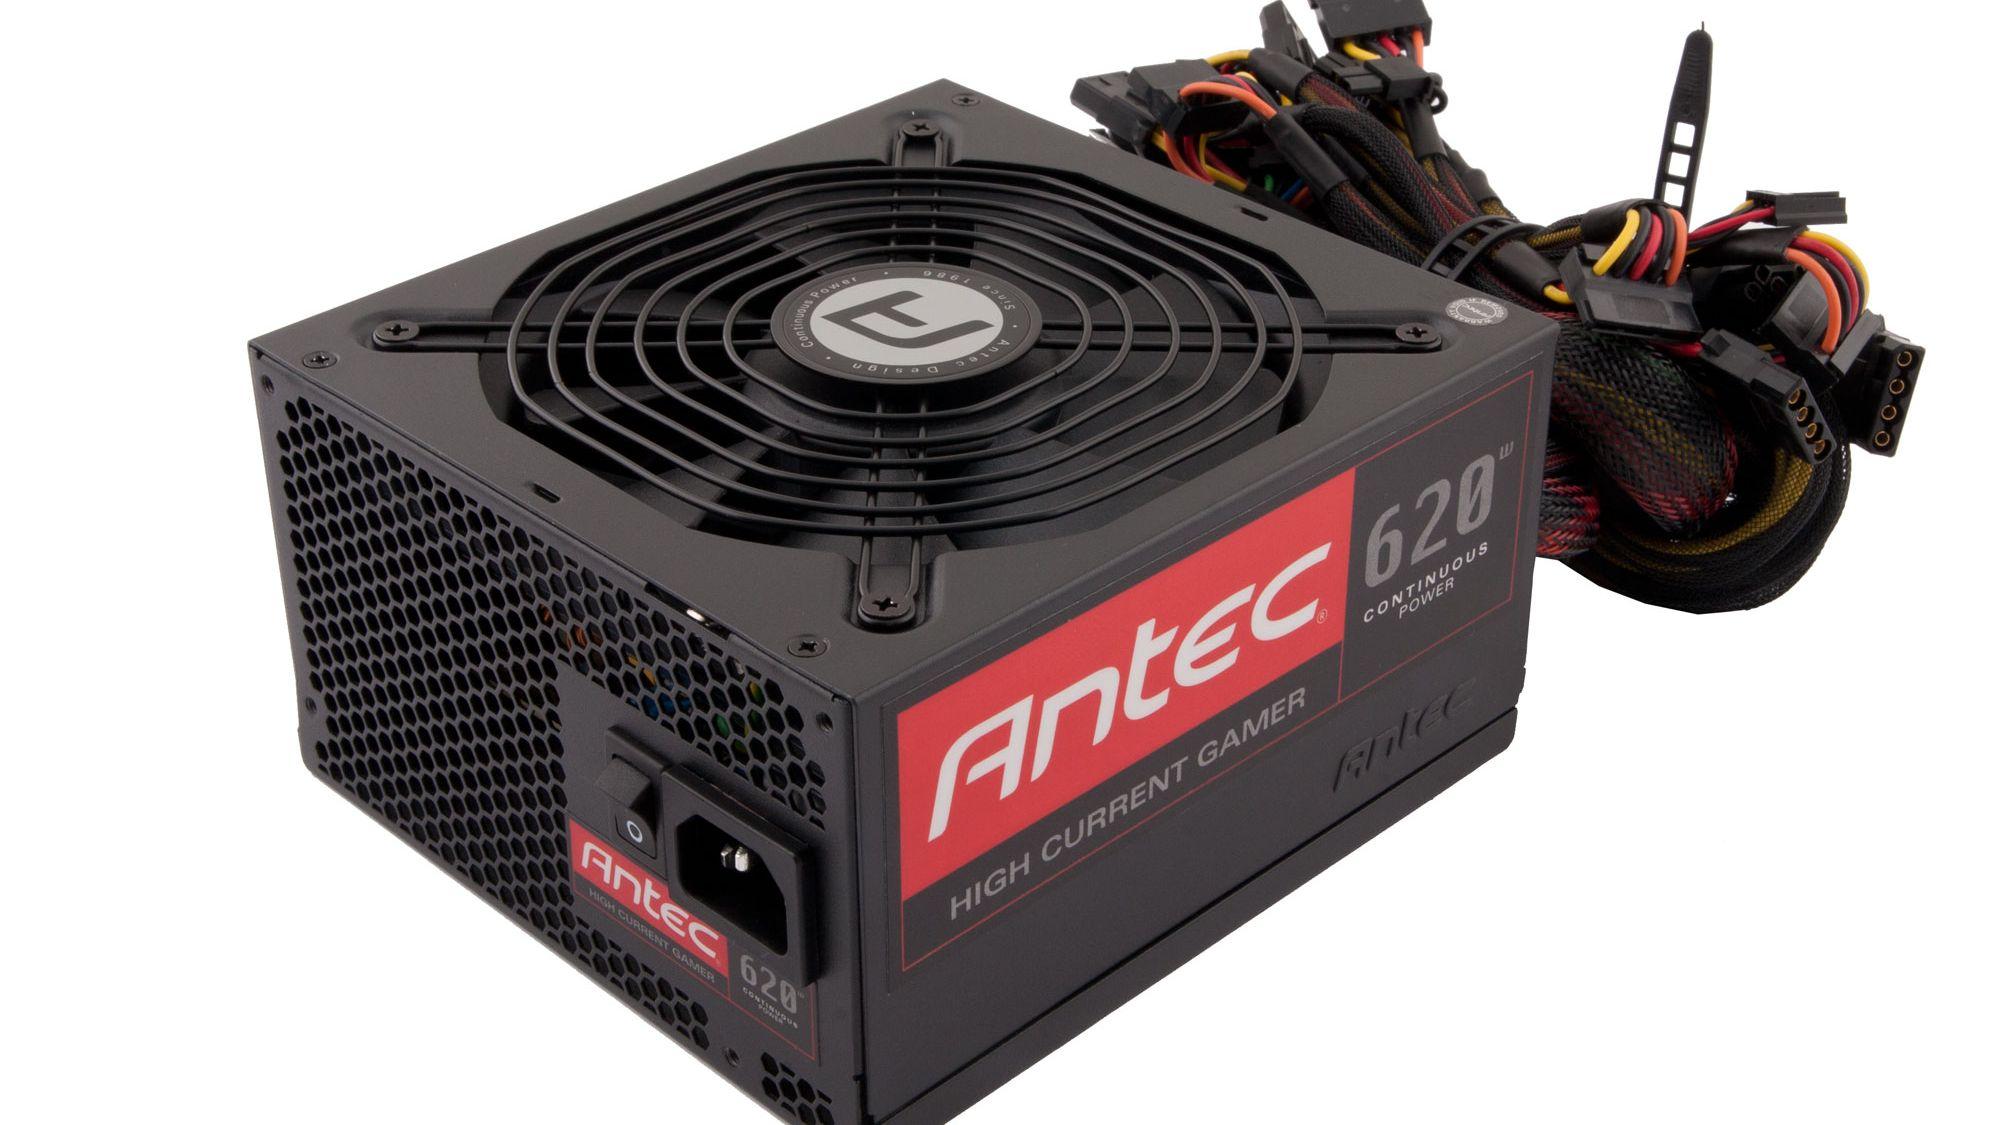 Antec High Current Gamer 620 W